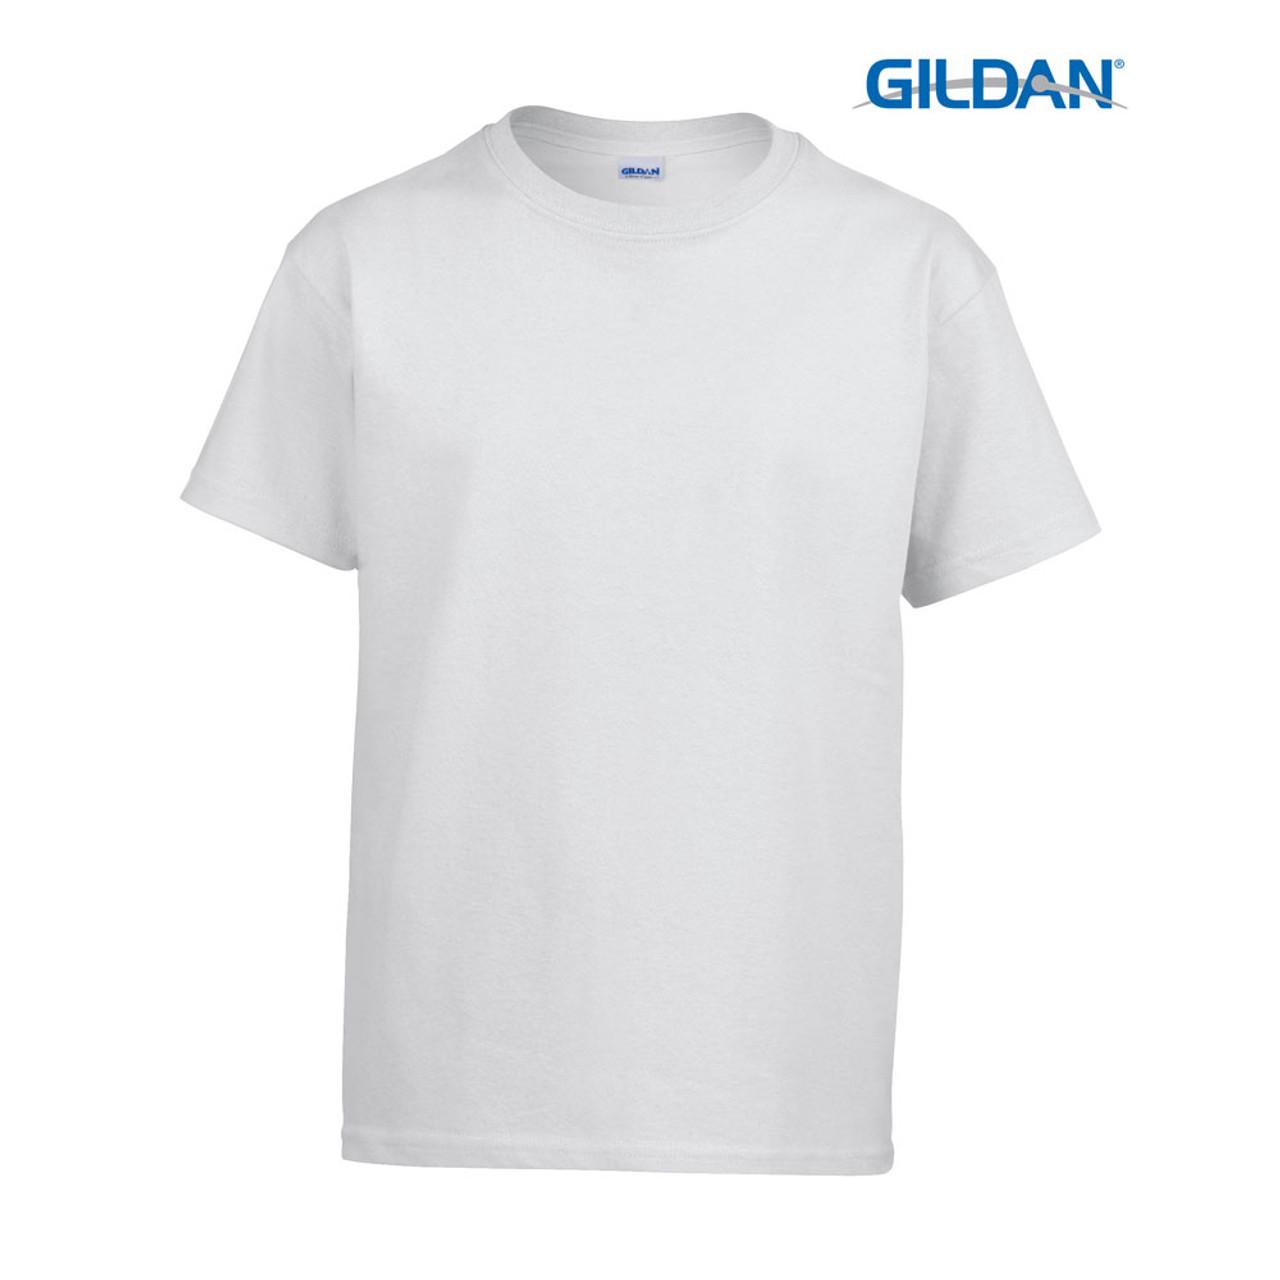 Gildan Youth Kid/'s Child Adult Cotton T-shirt Plain Blank G5000 New Wholesale